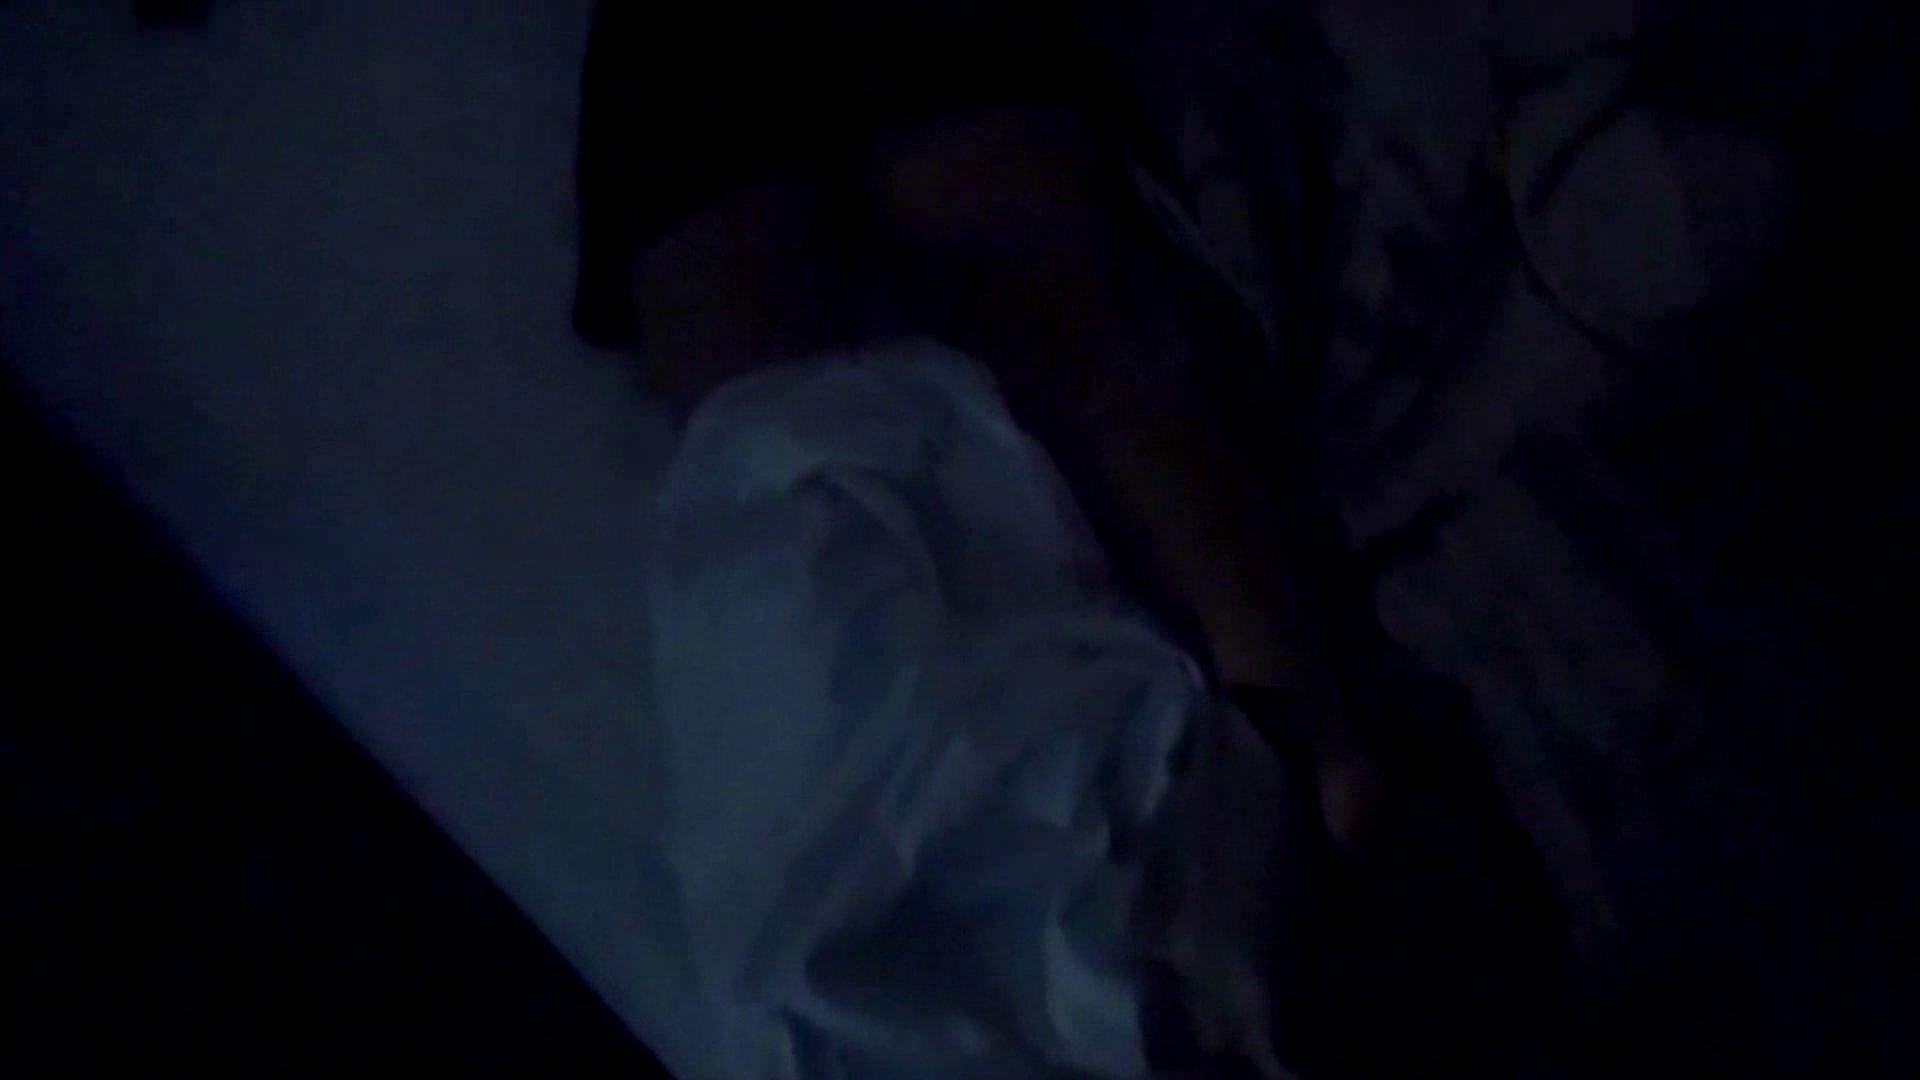 vol.33 【H・Kちゃん】 セクシー系ギャル現役JD 1回目 丸見え おまんこ無修正動画無料 111枚 6